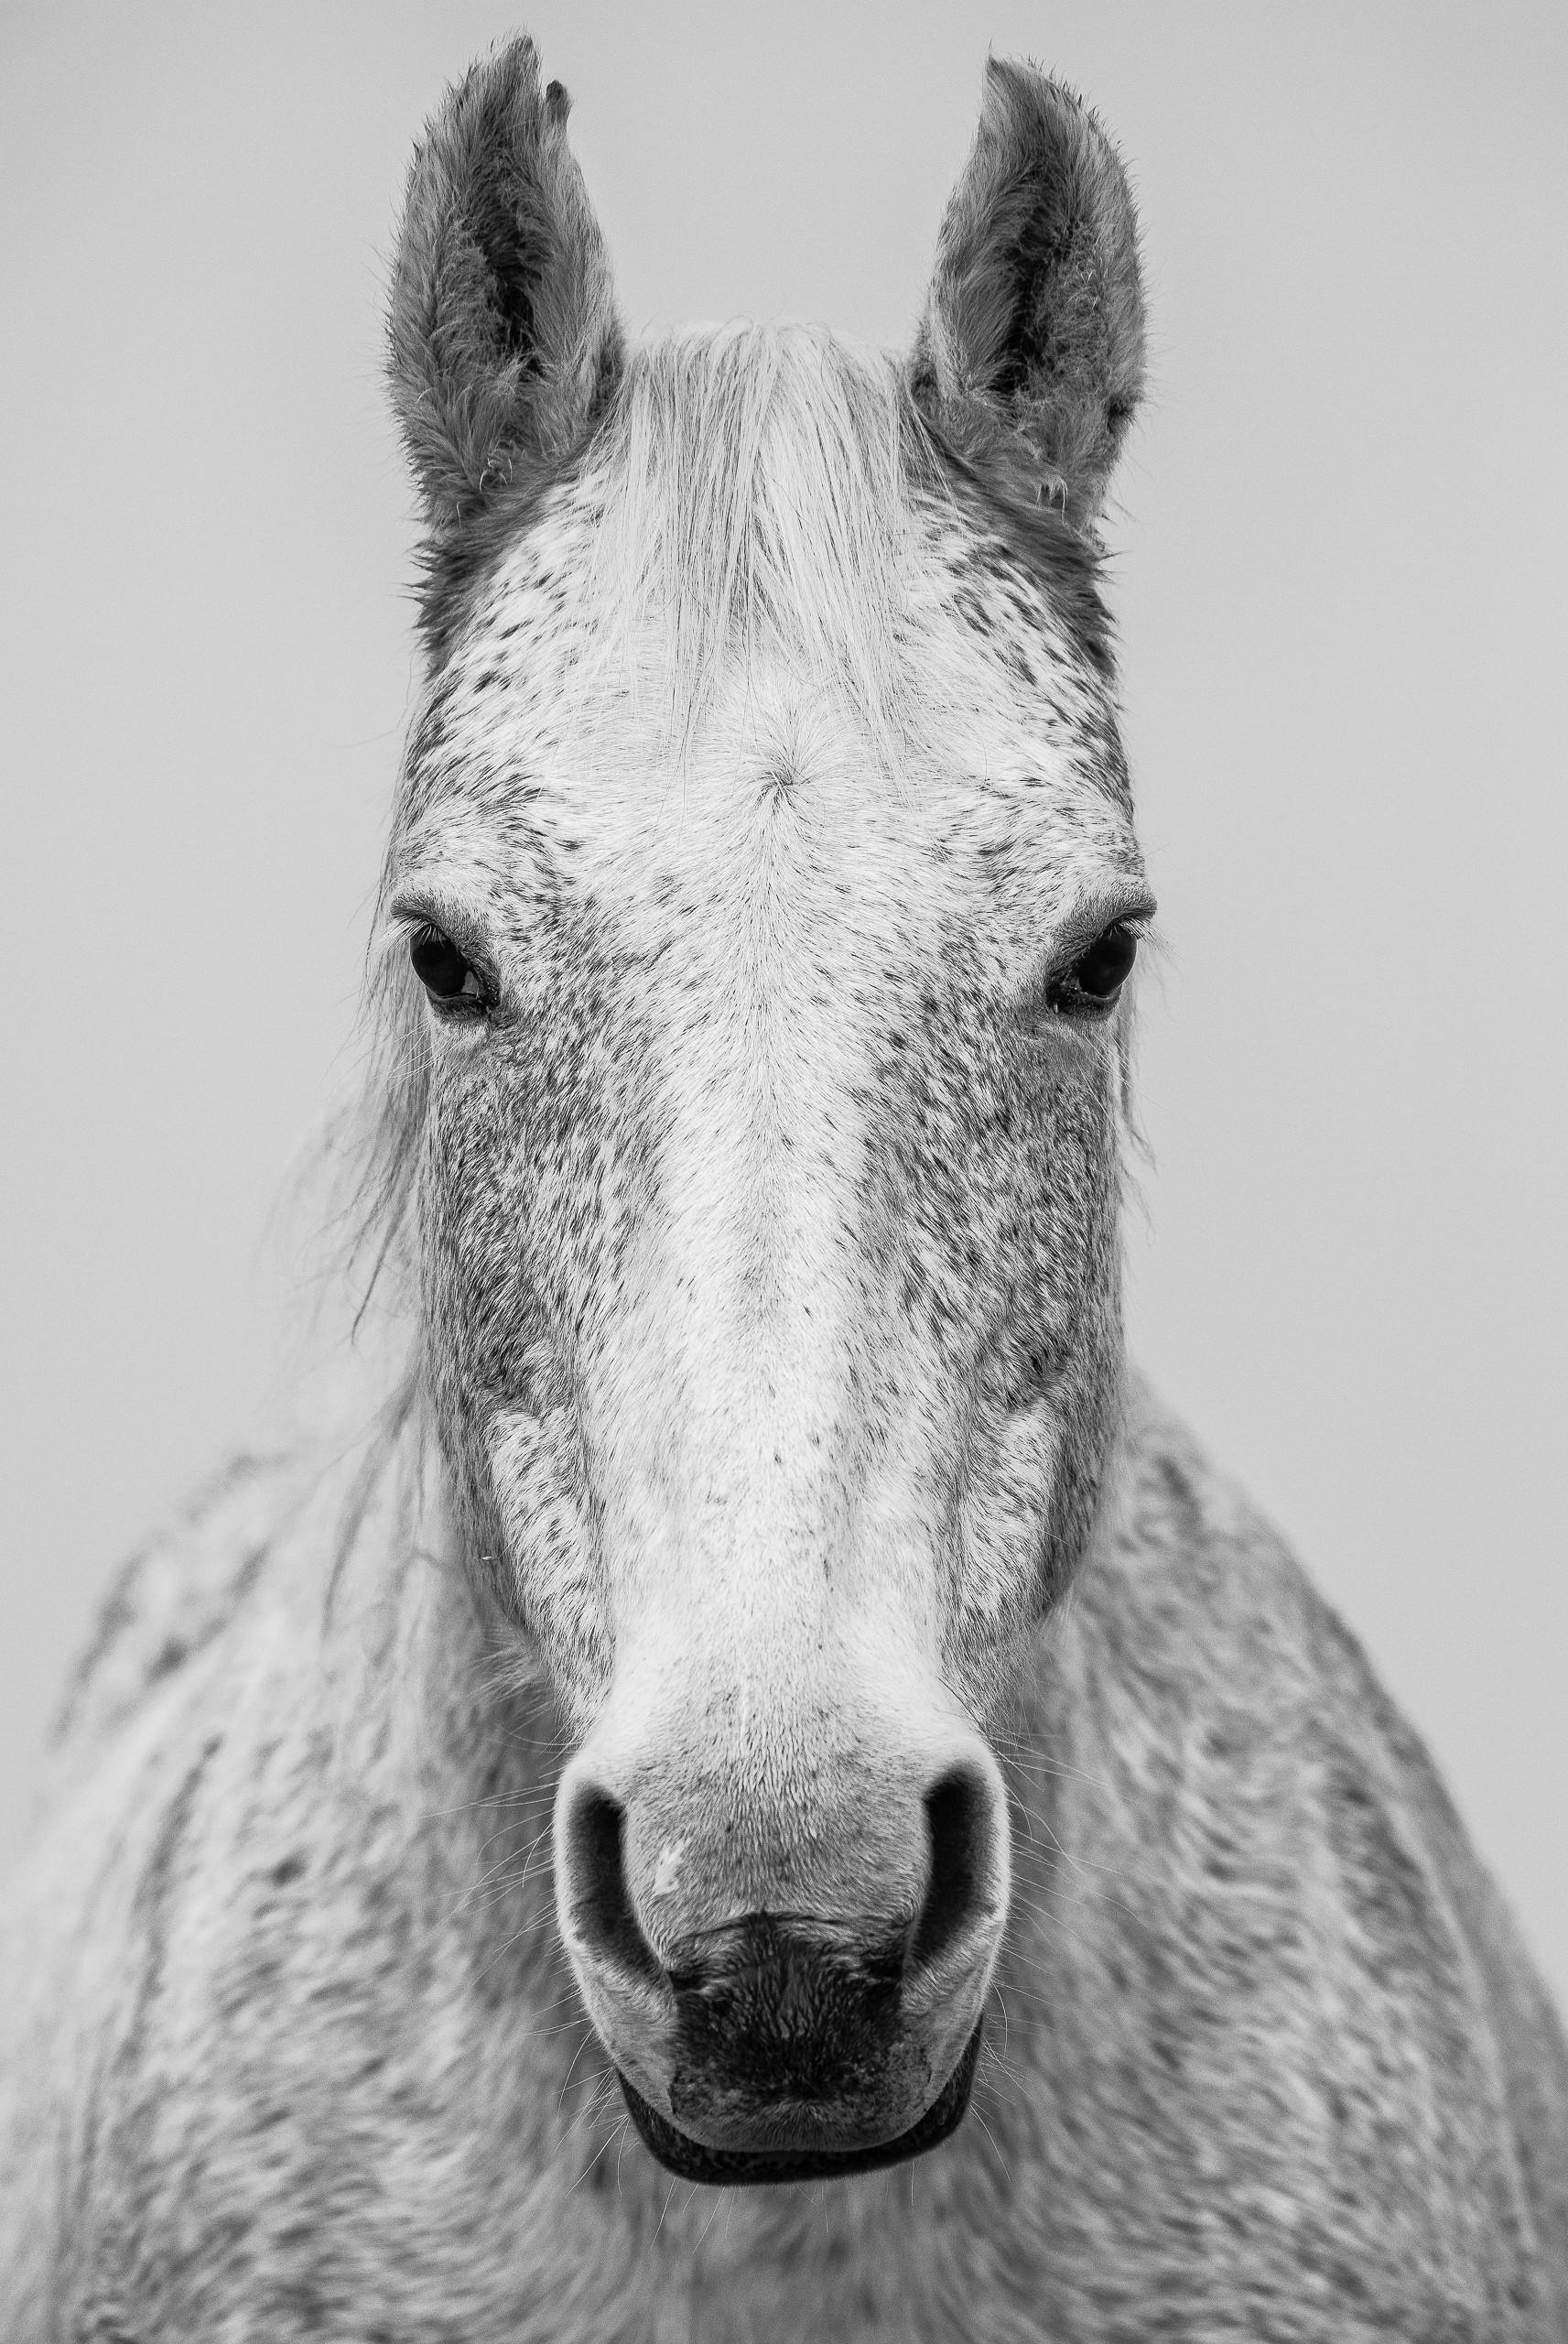 Horse Avedon Frontal